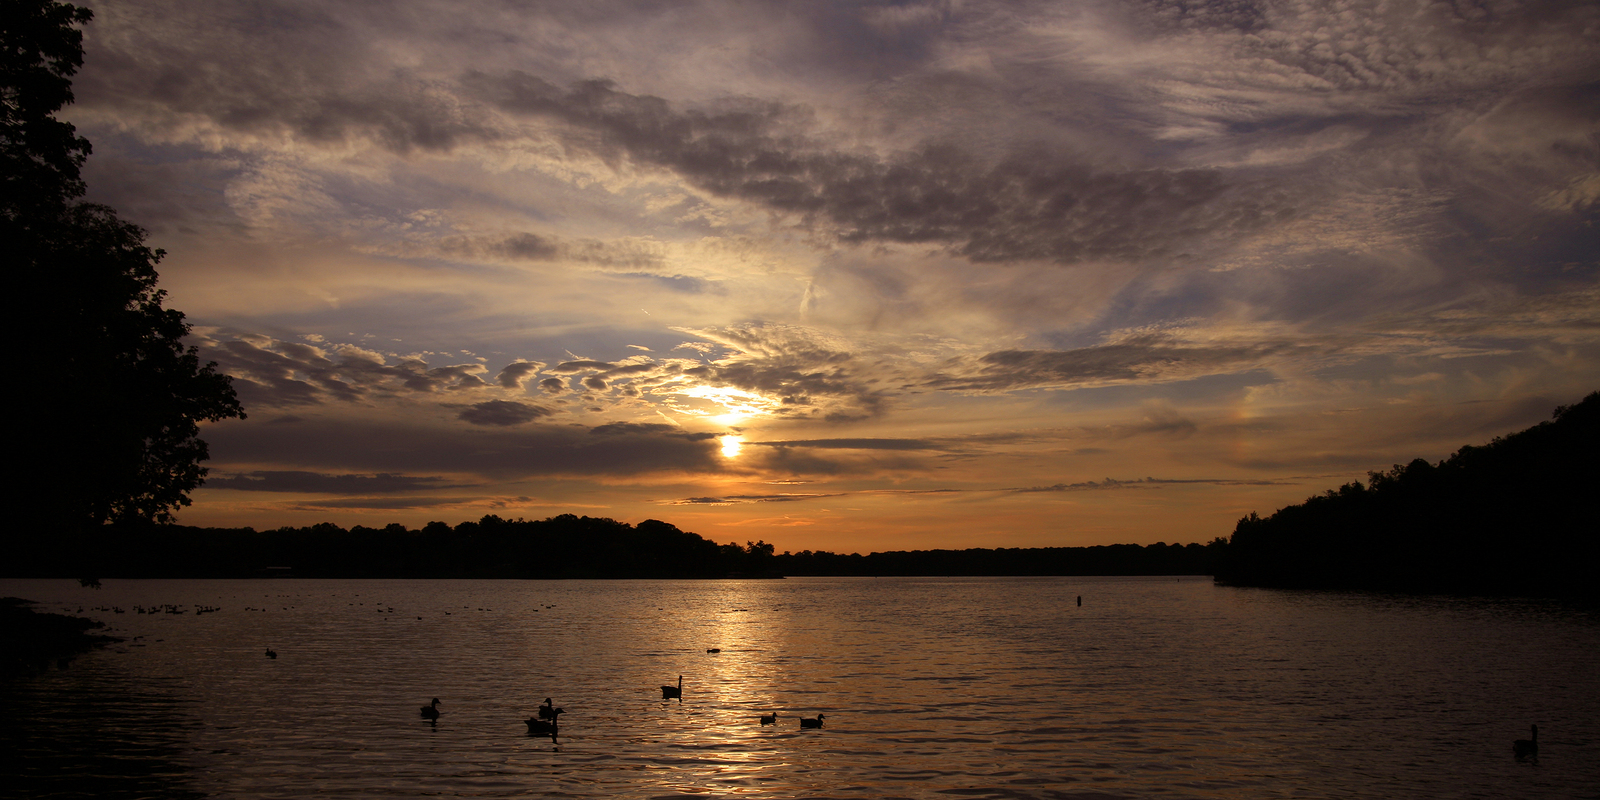 bigstock-Old-Hickory-Sunsets-5273545.jpg